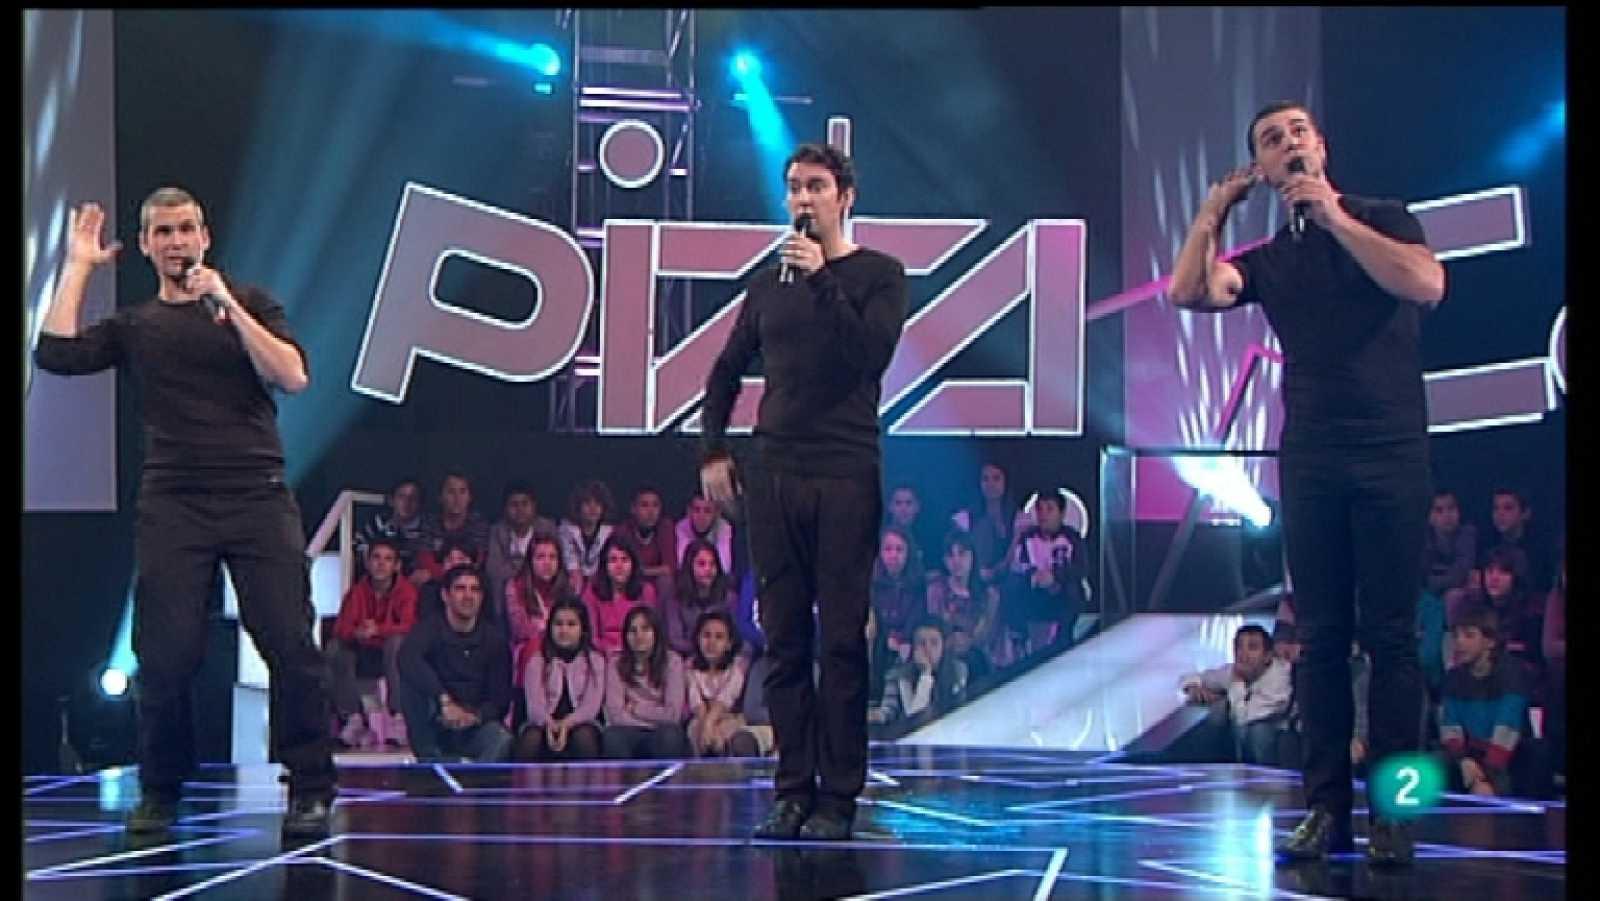 Pizzicato - B Vocal  - Ver ahora